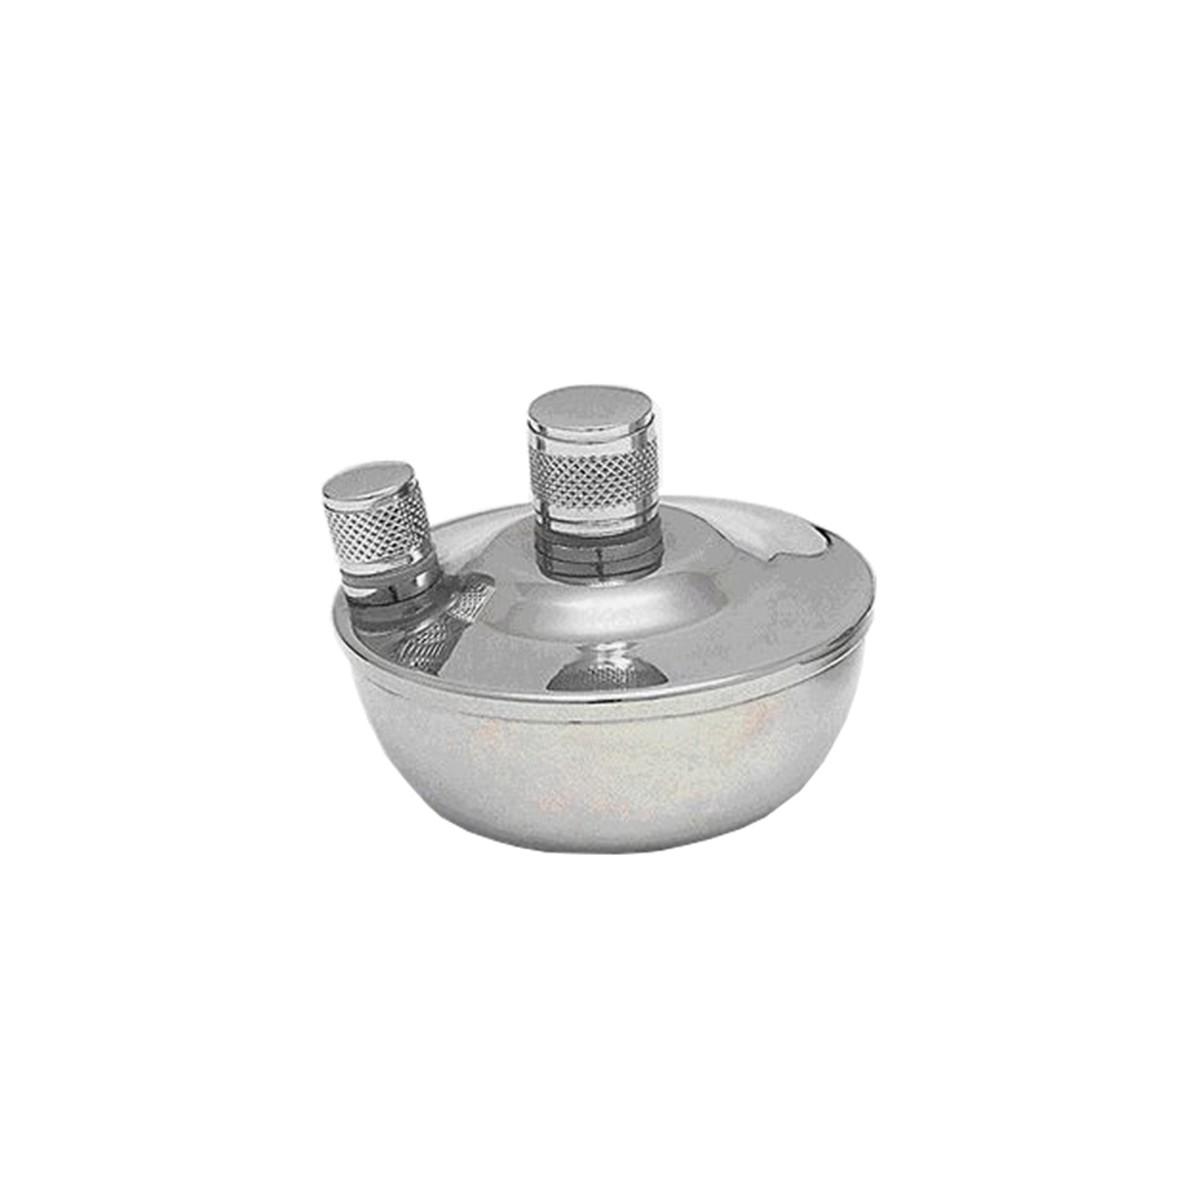 Lamparina Inox Simples 40ml - Können